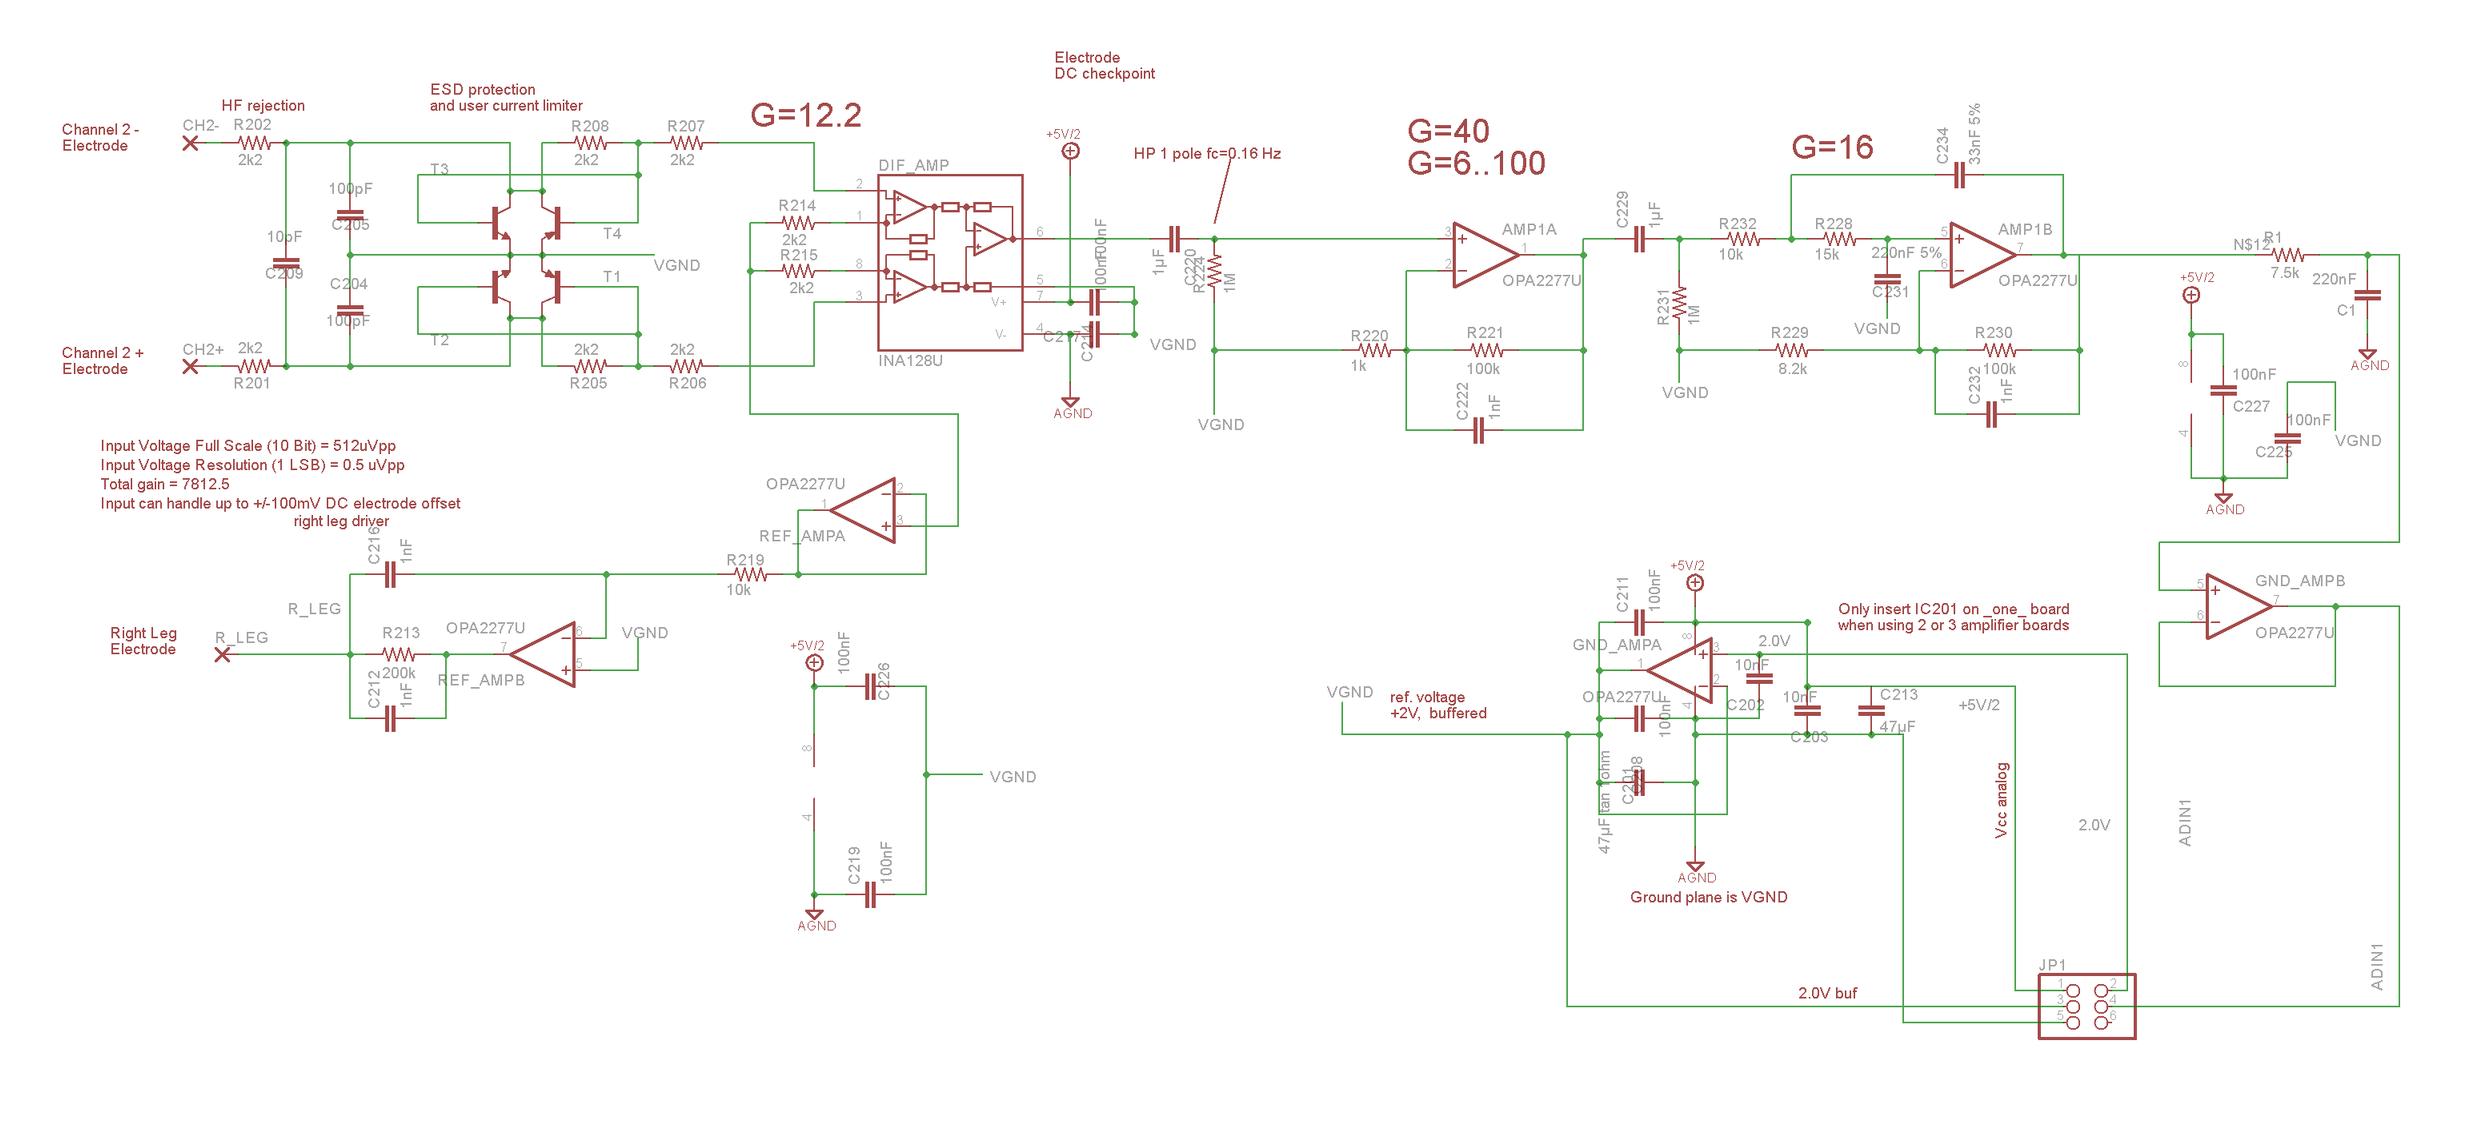 OpenEEG schematic for circuit board - lives inside belt box